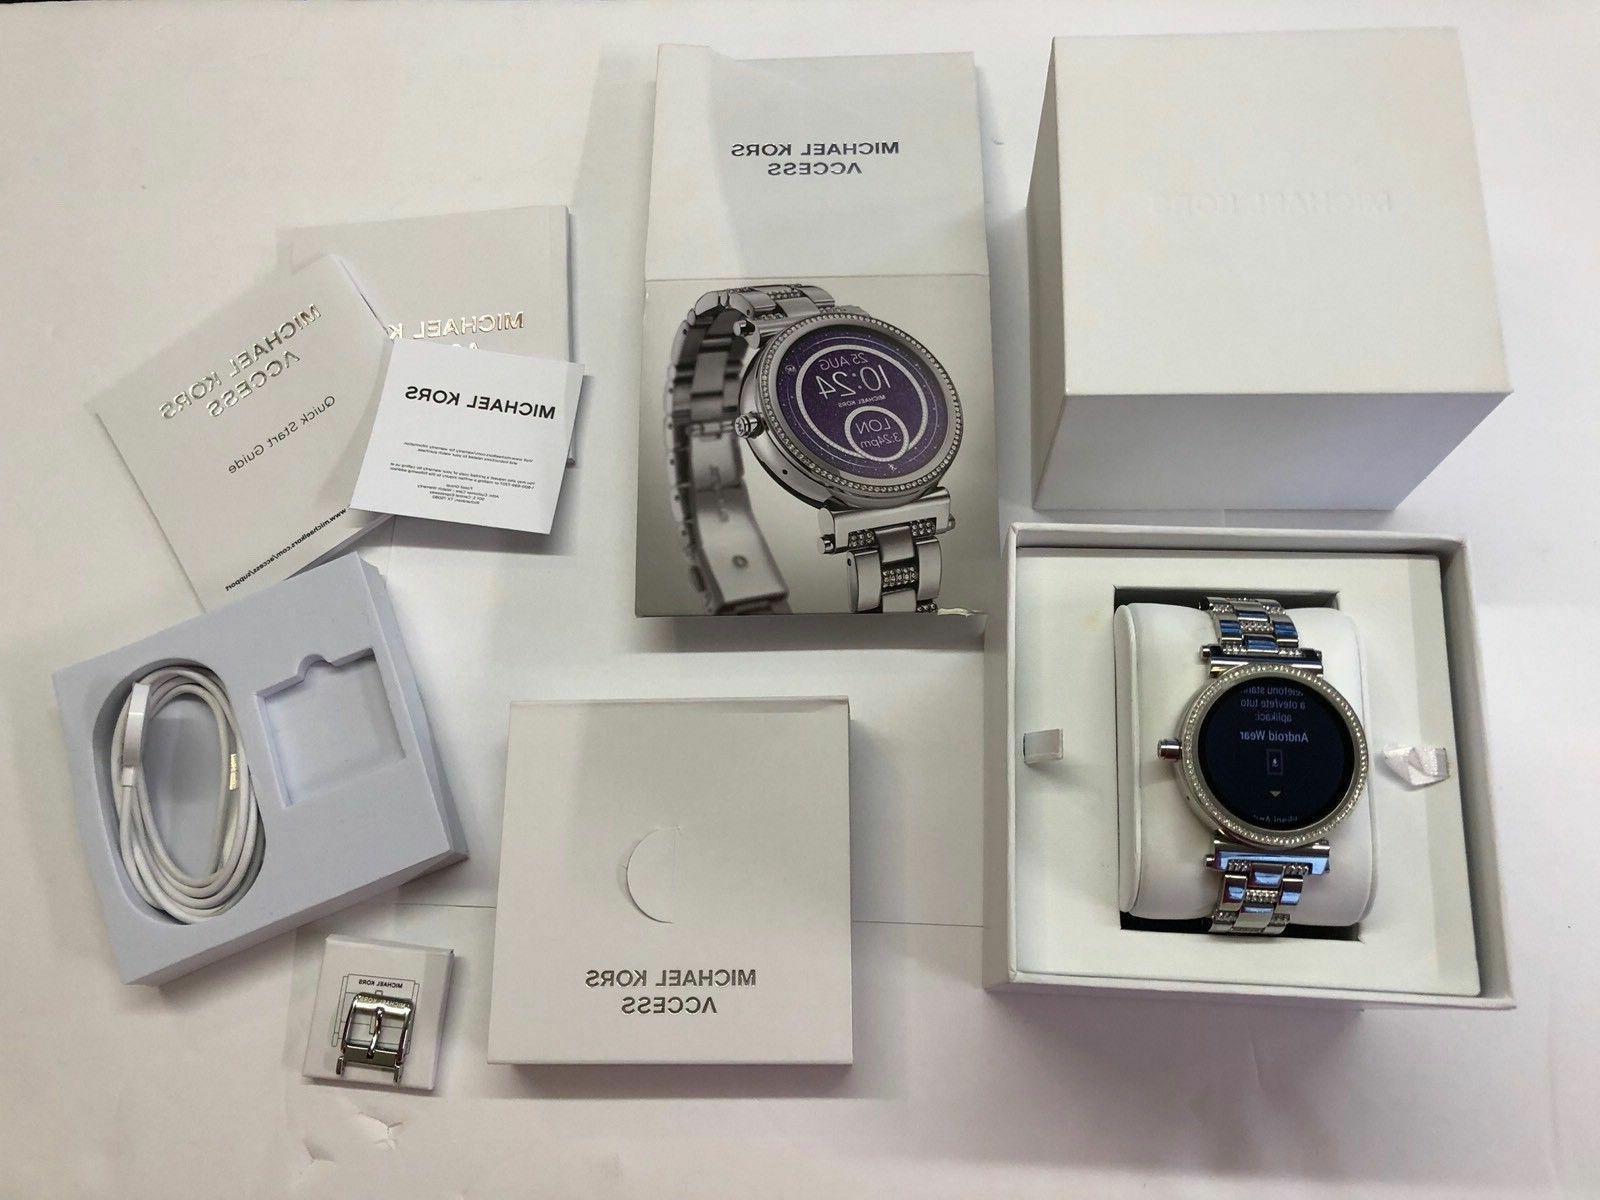 Michael Smartwatch, Stainless MKT5036